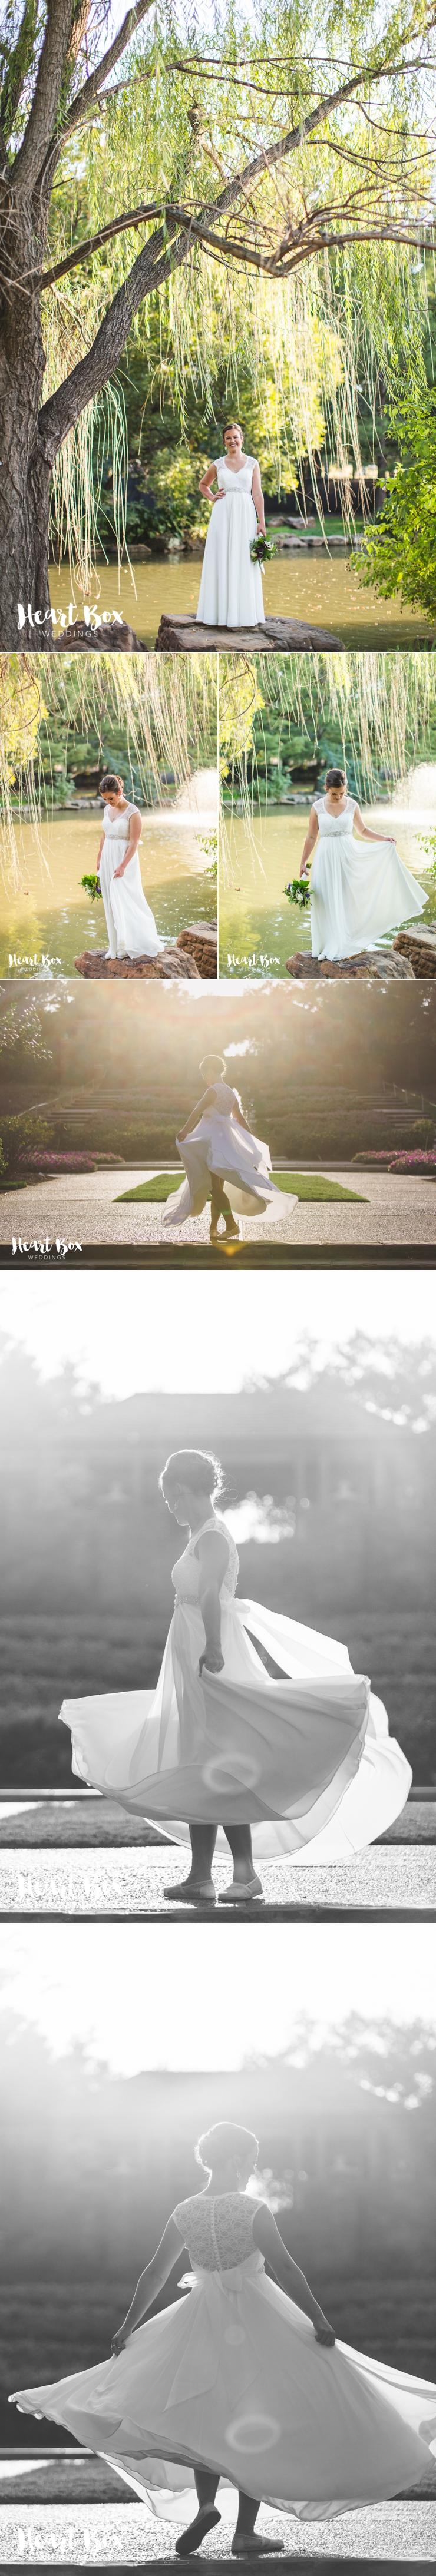 Hailey Bridal Blog Collages 6.jpg